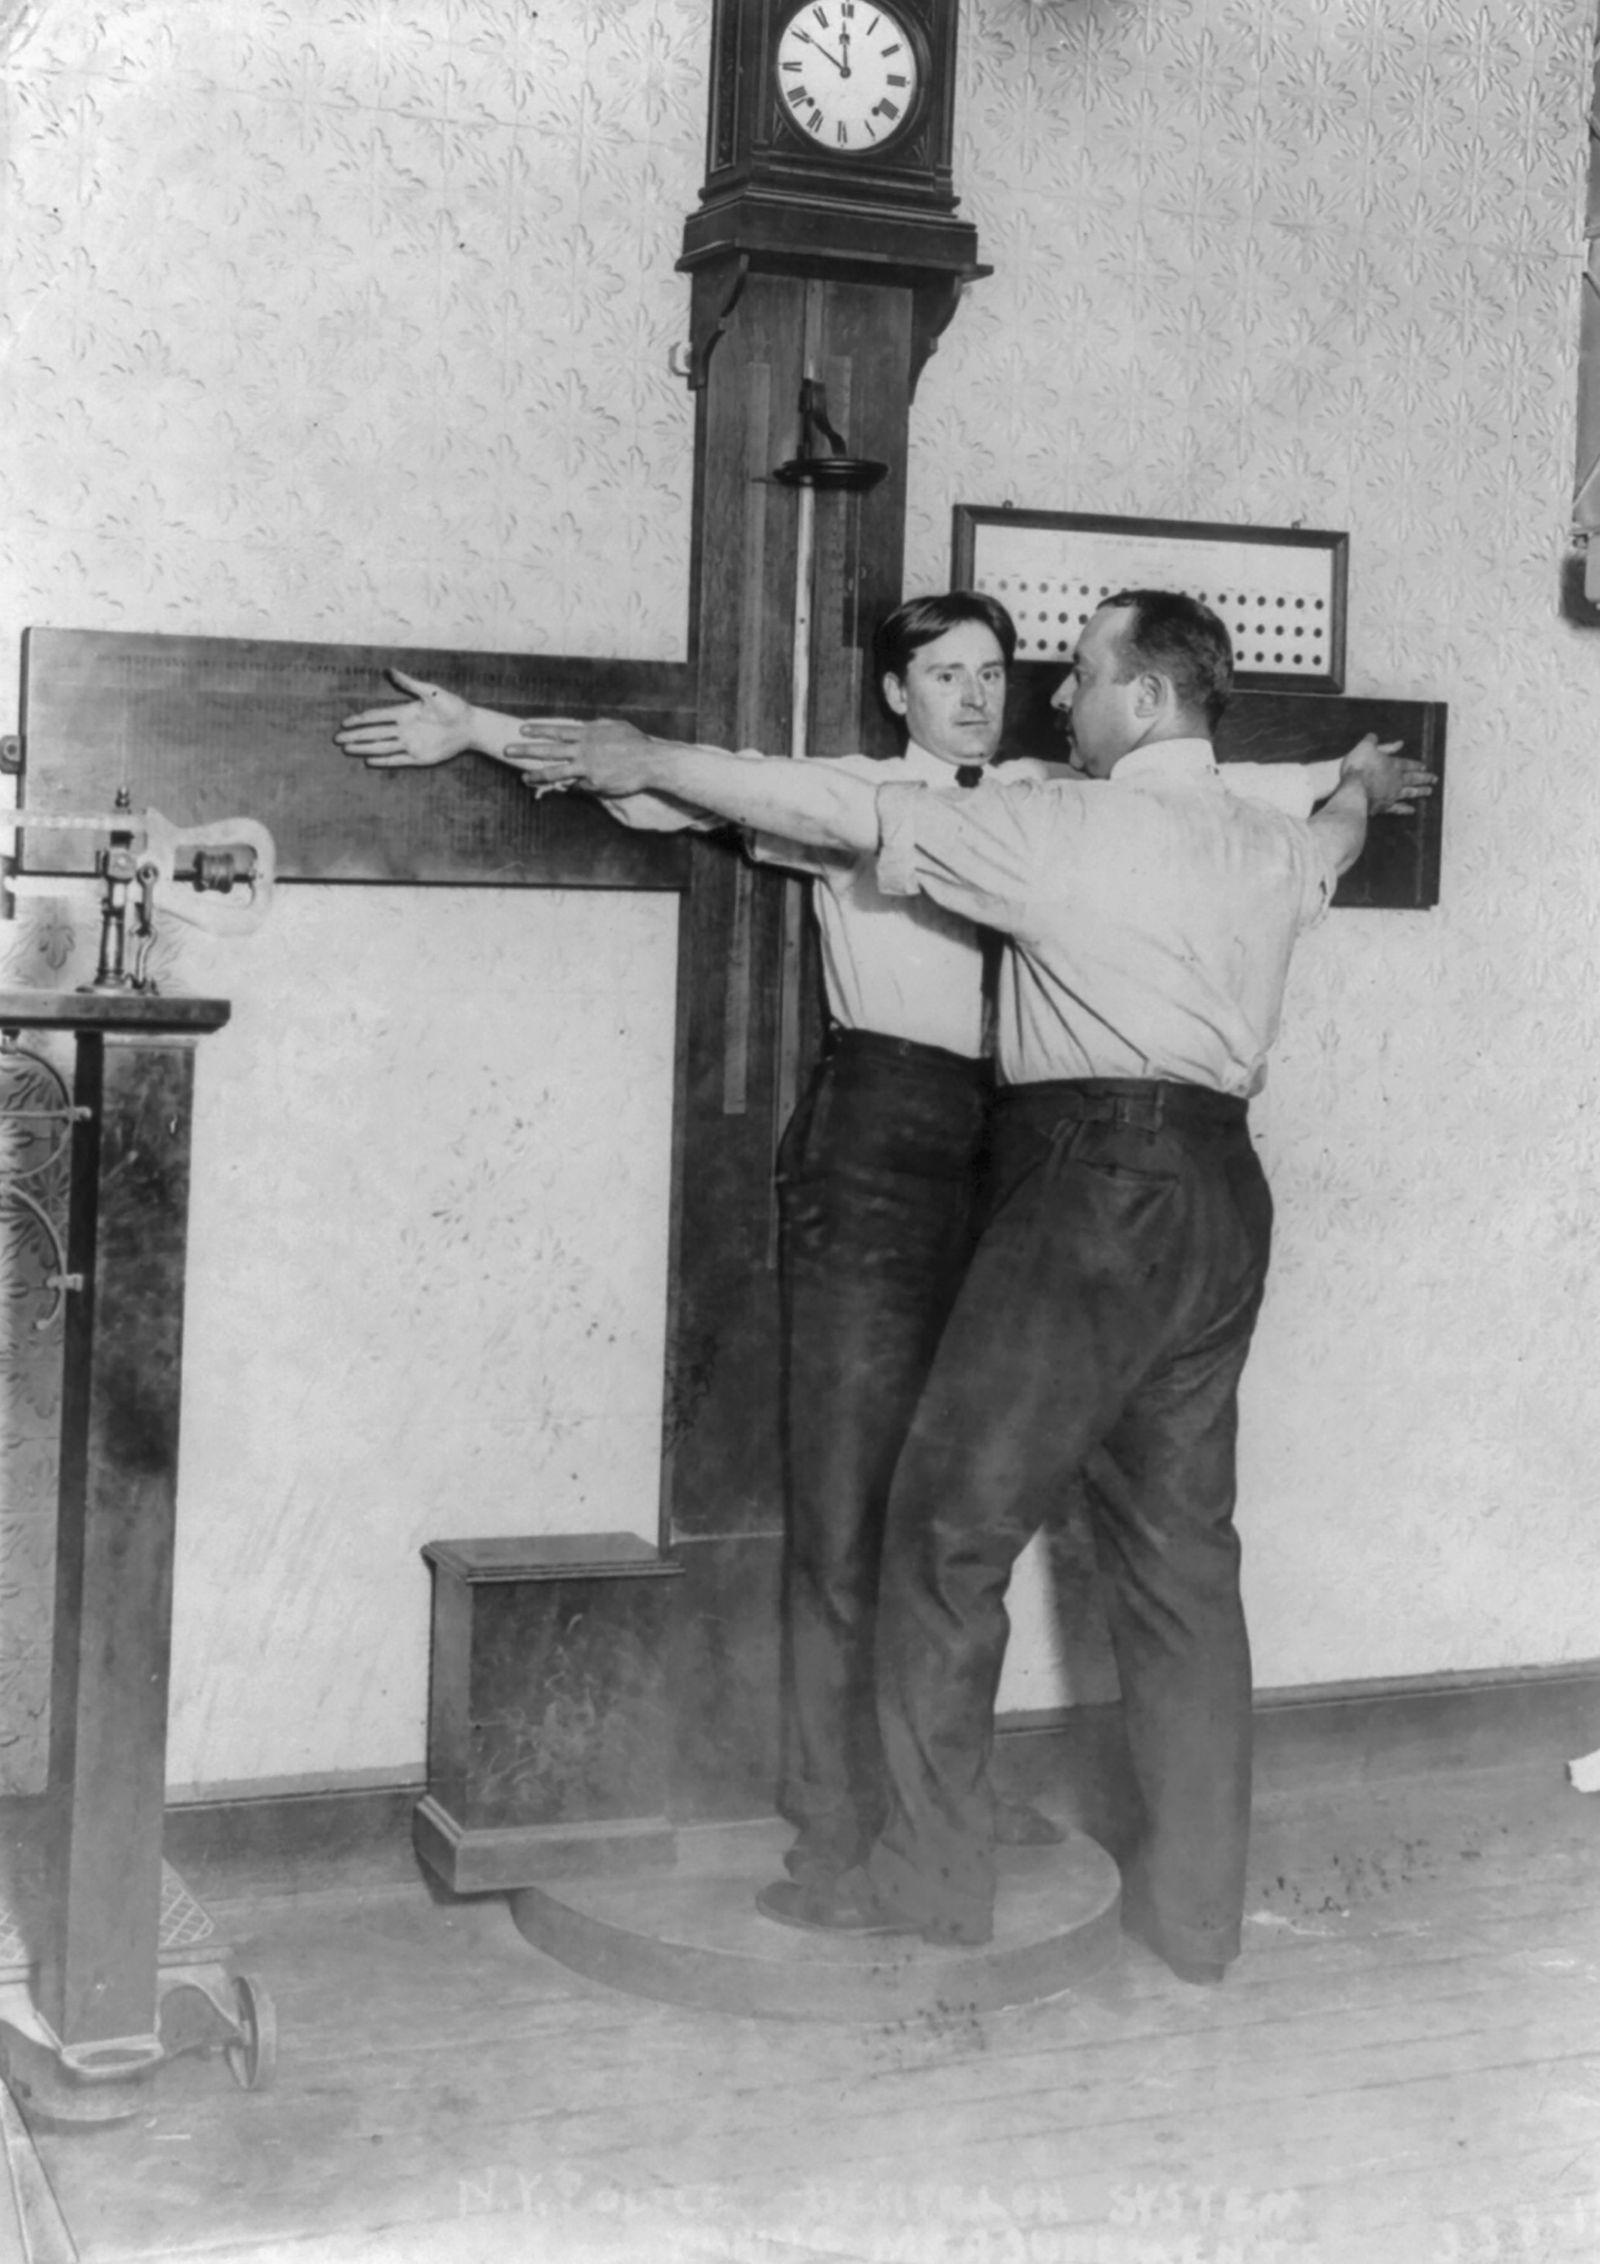 Forensik - New York City Police Dept. activities: taking Bertillon measurements--armspan